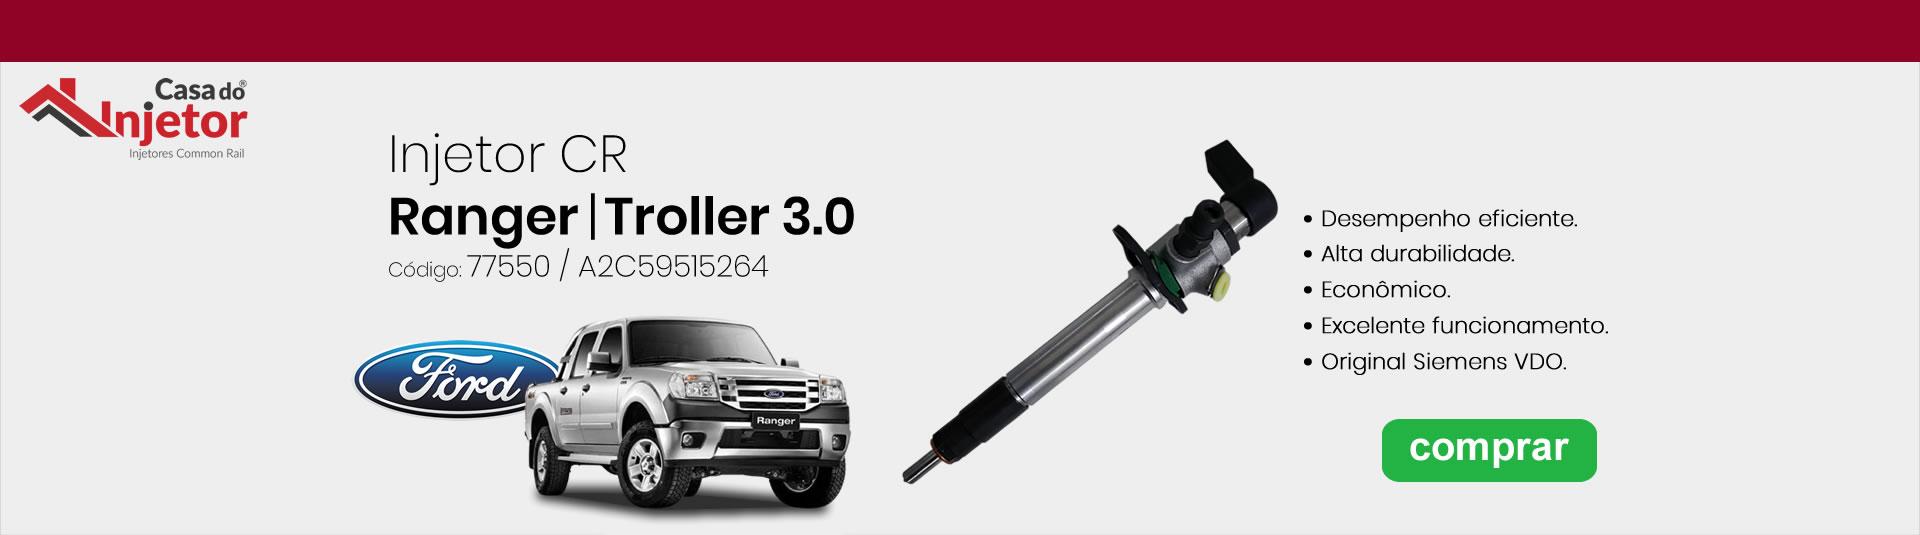 Injetor Ranger 3.0 Cód.77550